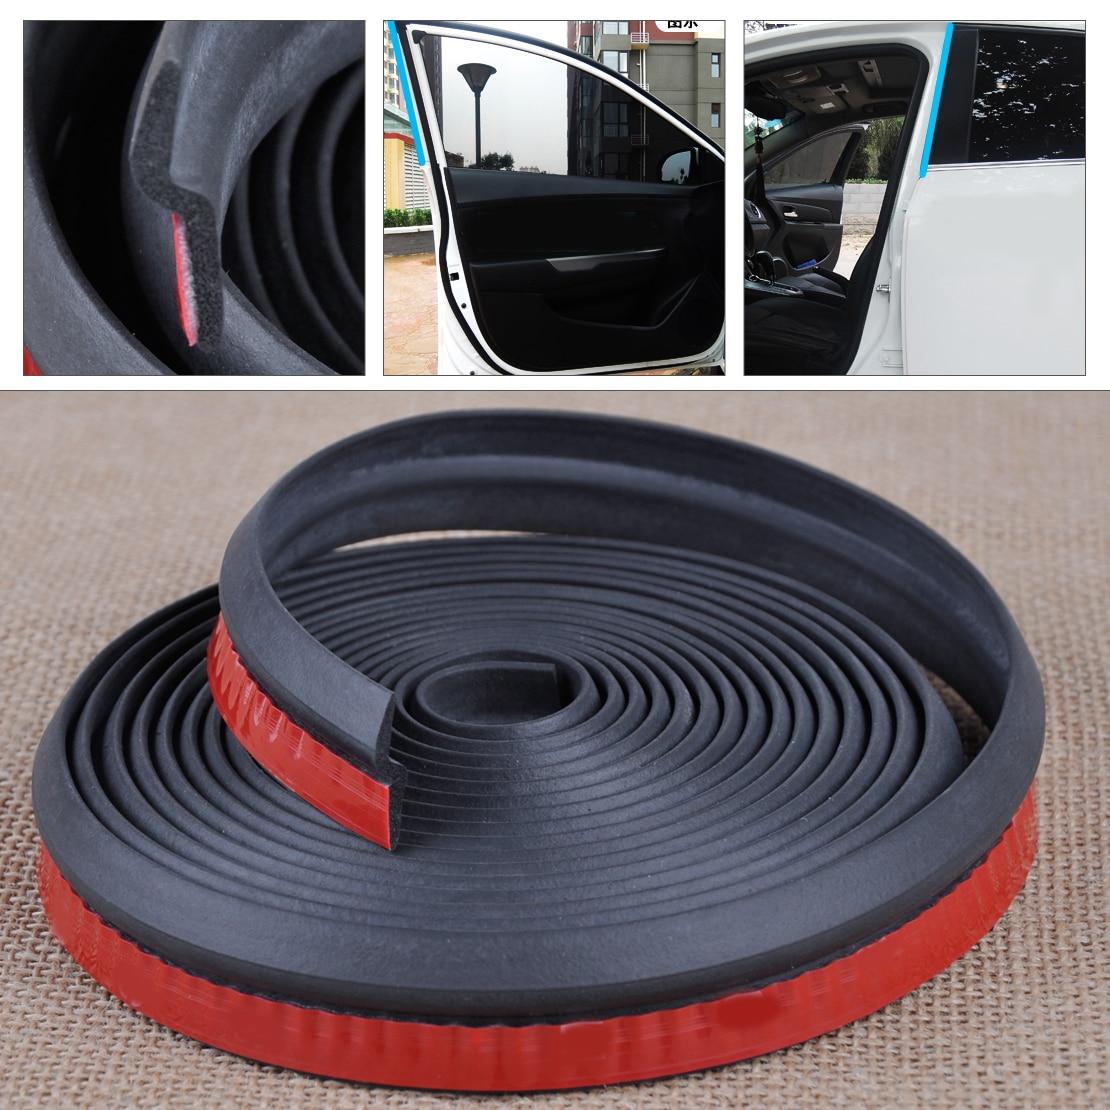 CITALL 8M/4M/5M D/P/Z/B Shape Car Door Edge Rubber Seal Weatherstrip Hollow Soundproof Dustproof Moulding Trim Protector